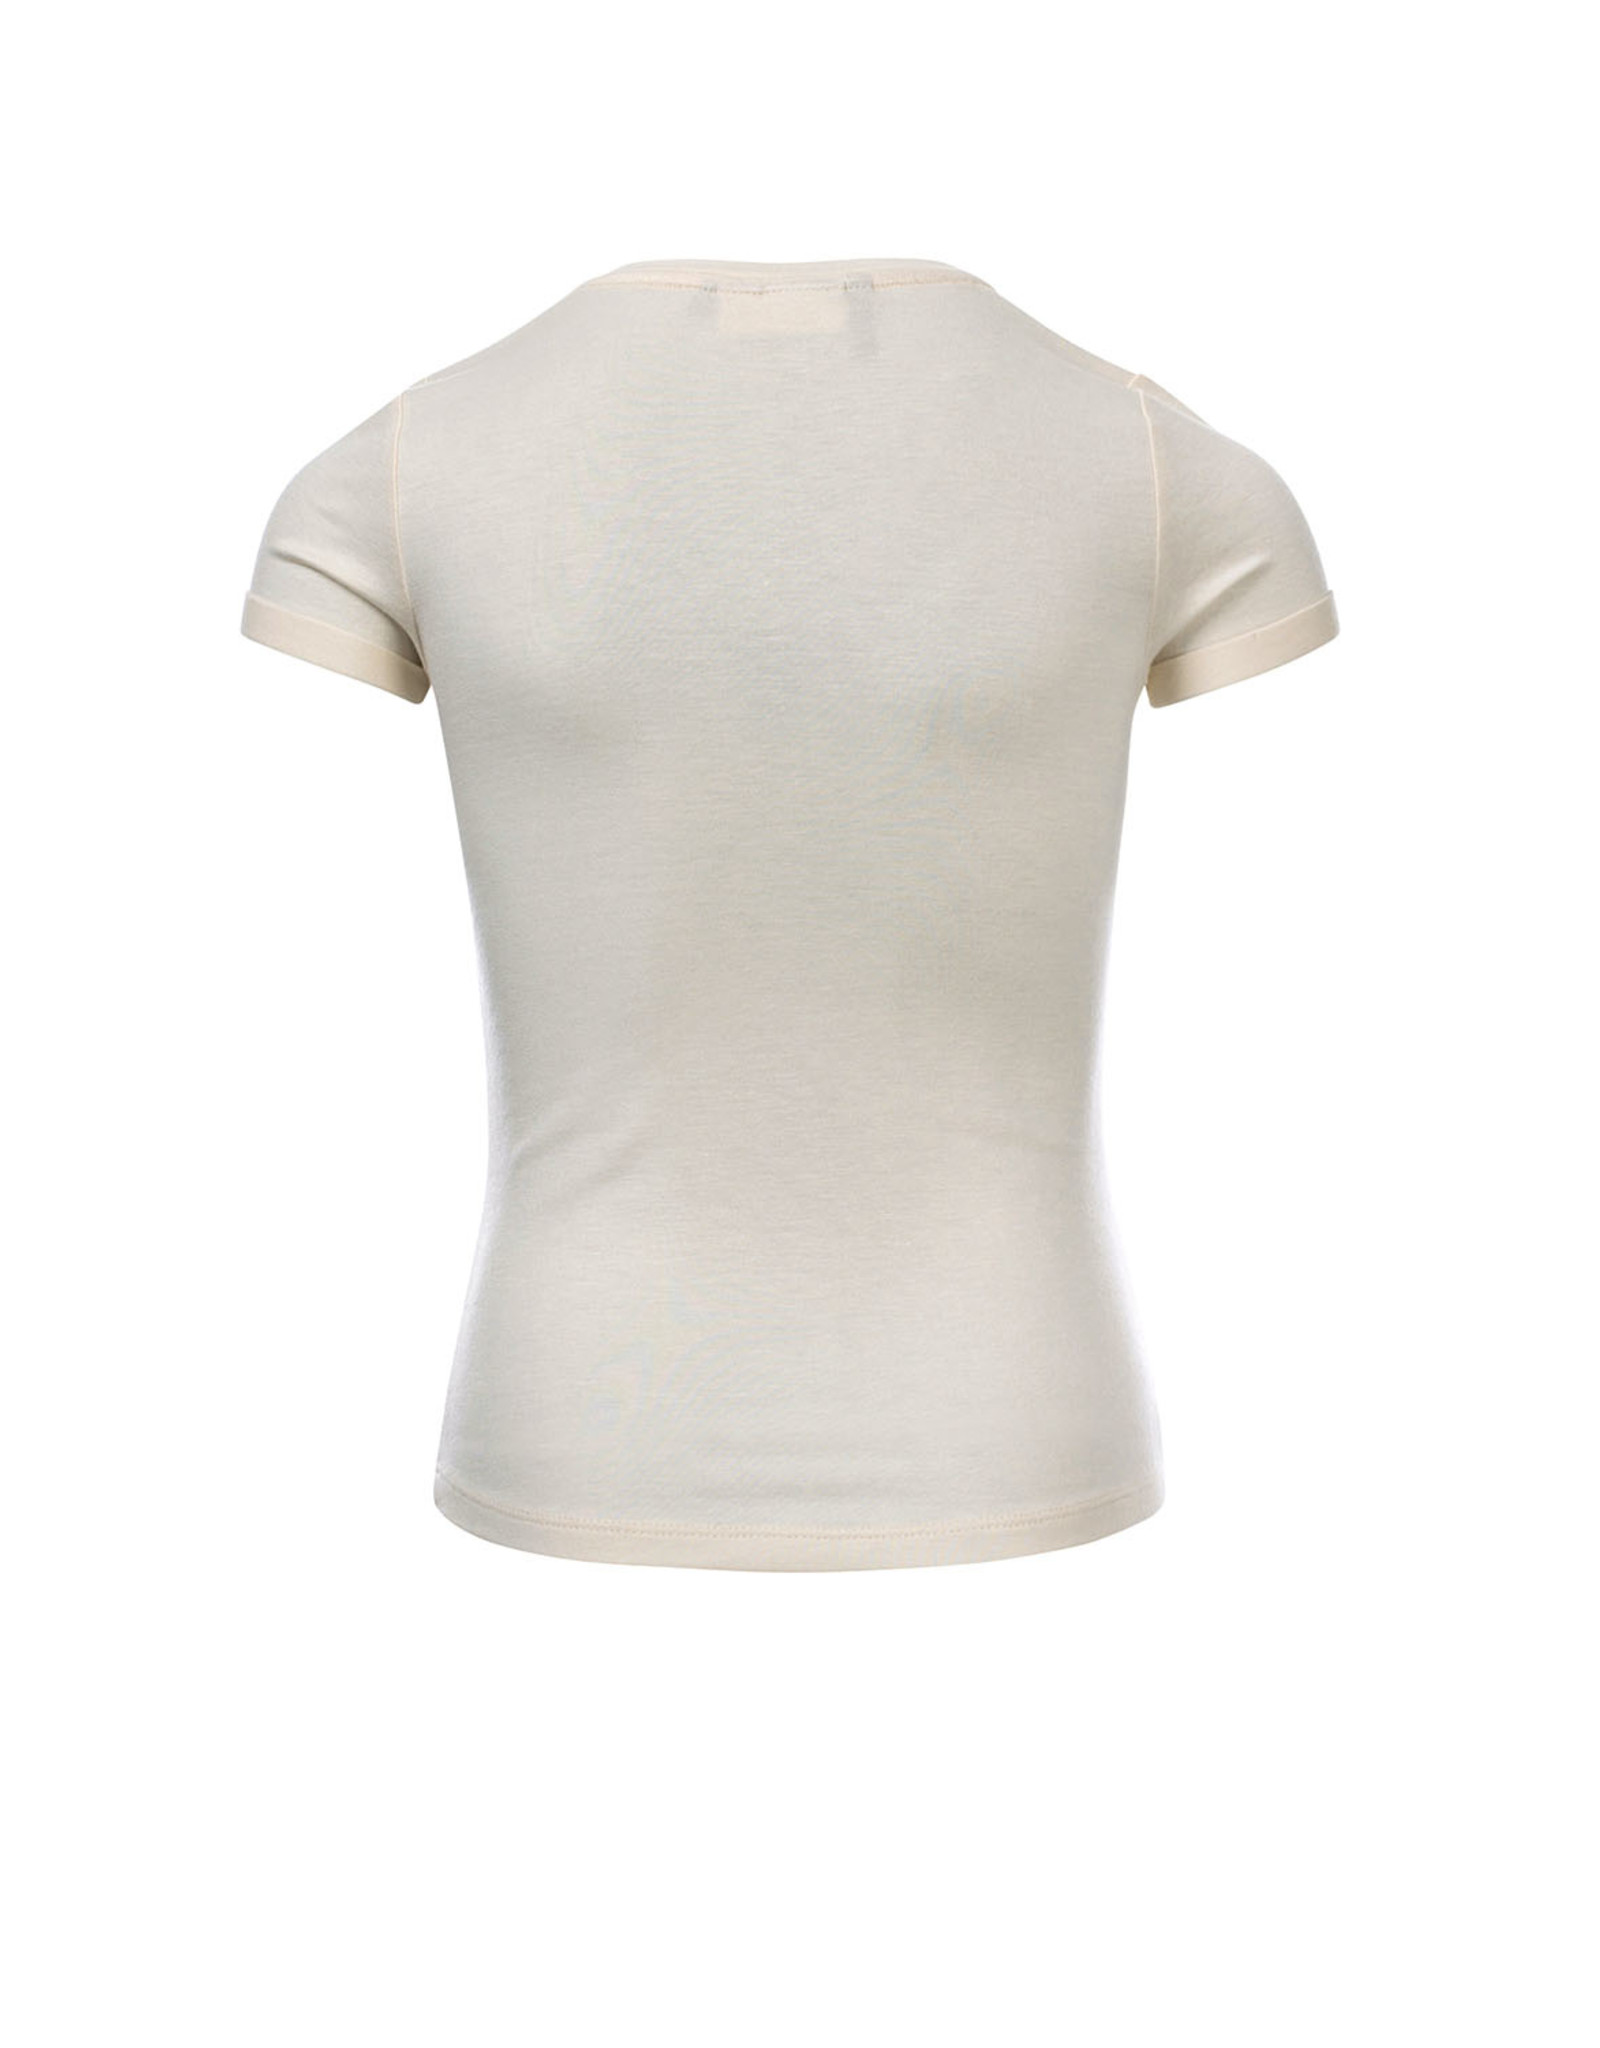 Looxs 10Sixteen T-shirt MILK